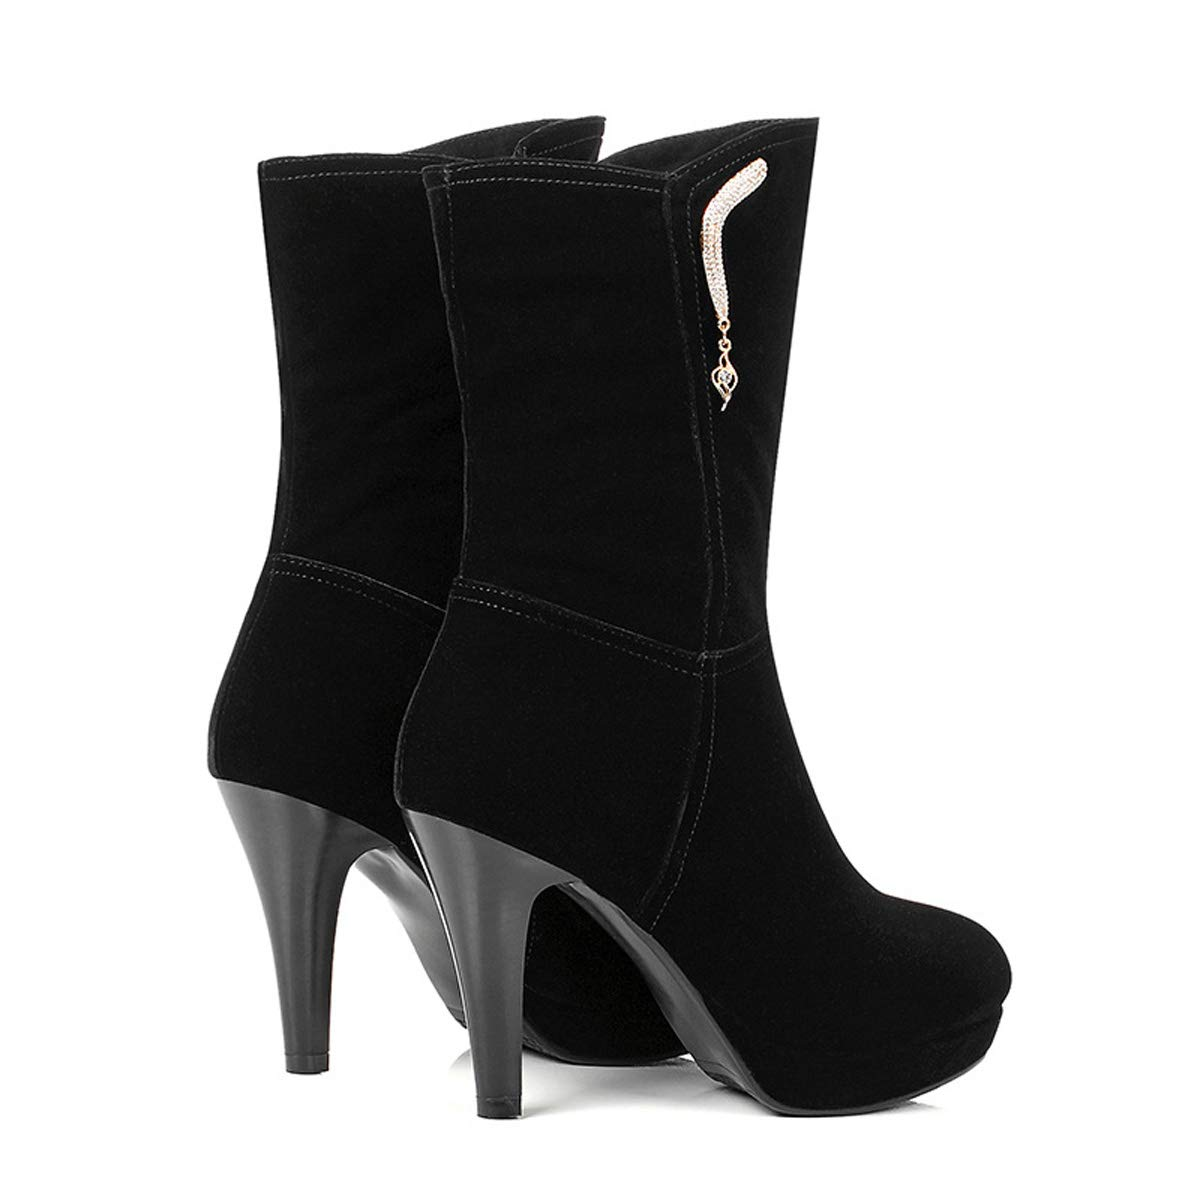 DANDANJIE damen High Heels Stiefel Mid Calf Knee Zipper Zipper Zipper Tassel schuhe Winter Martin Stiefelies Elegant Suede Stiefel 202445